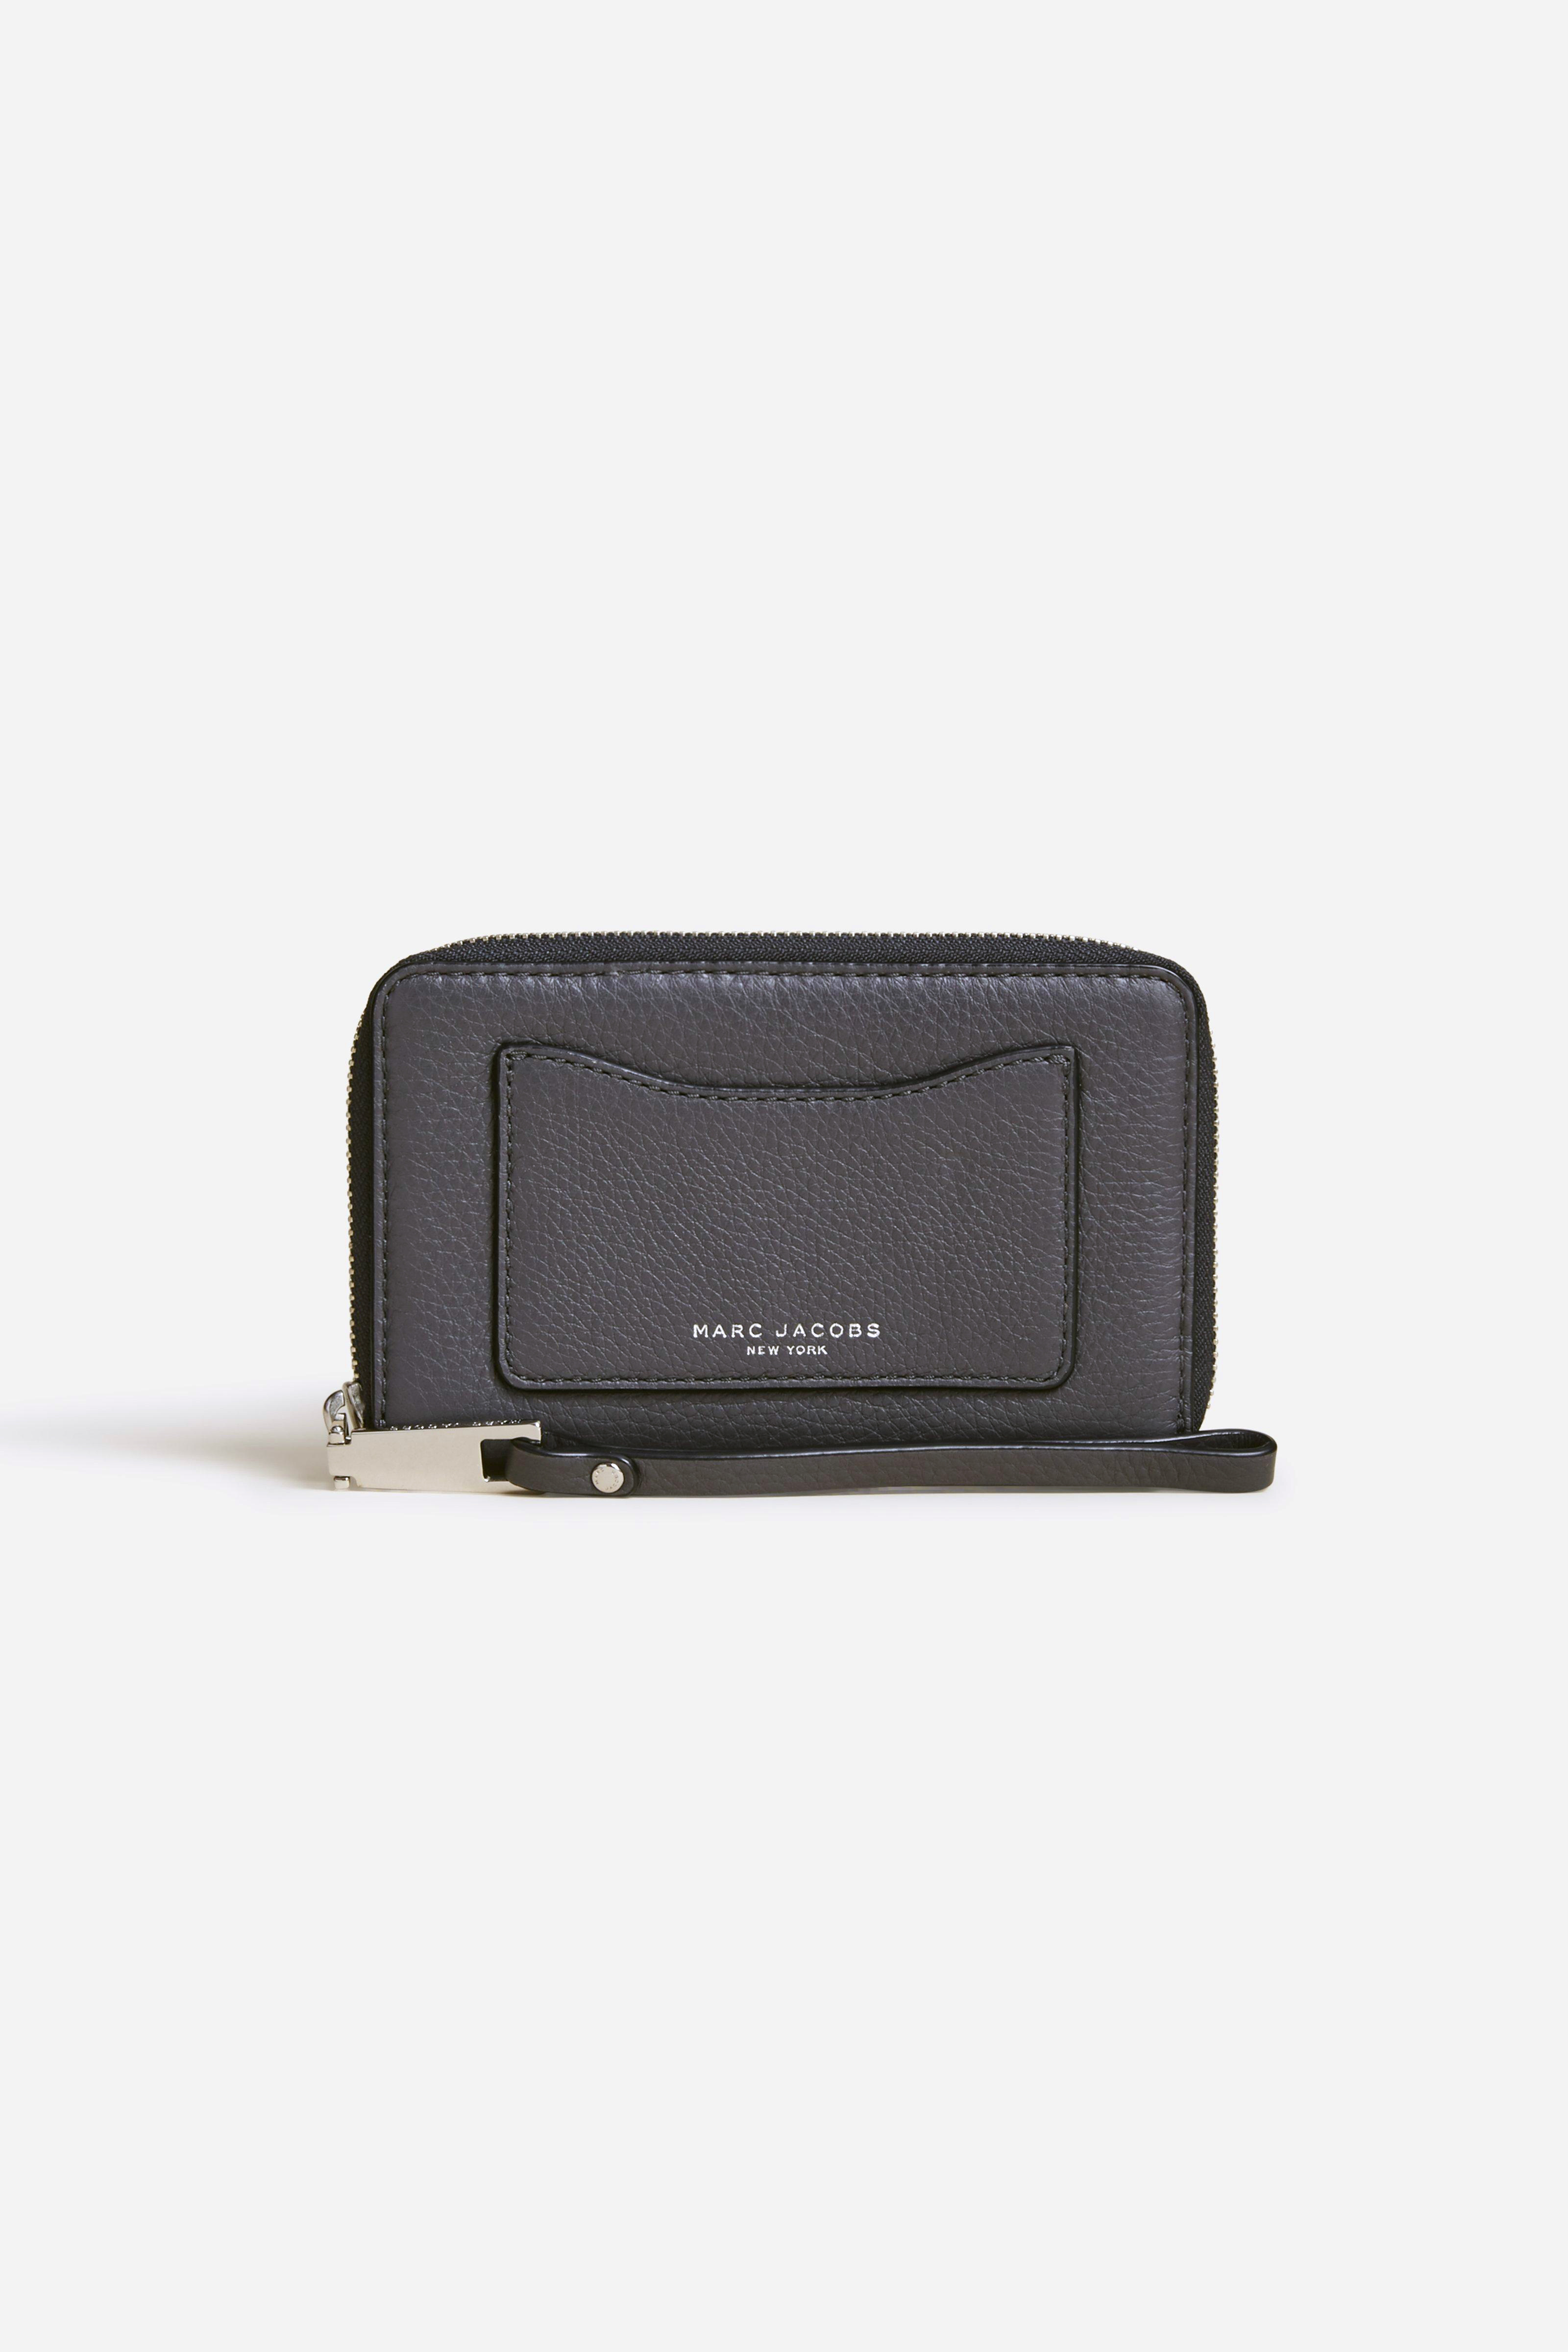 Marc Jacobs 12 - Recruit Zip Phone Wristlet - Shadow